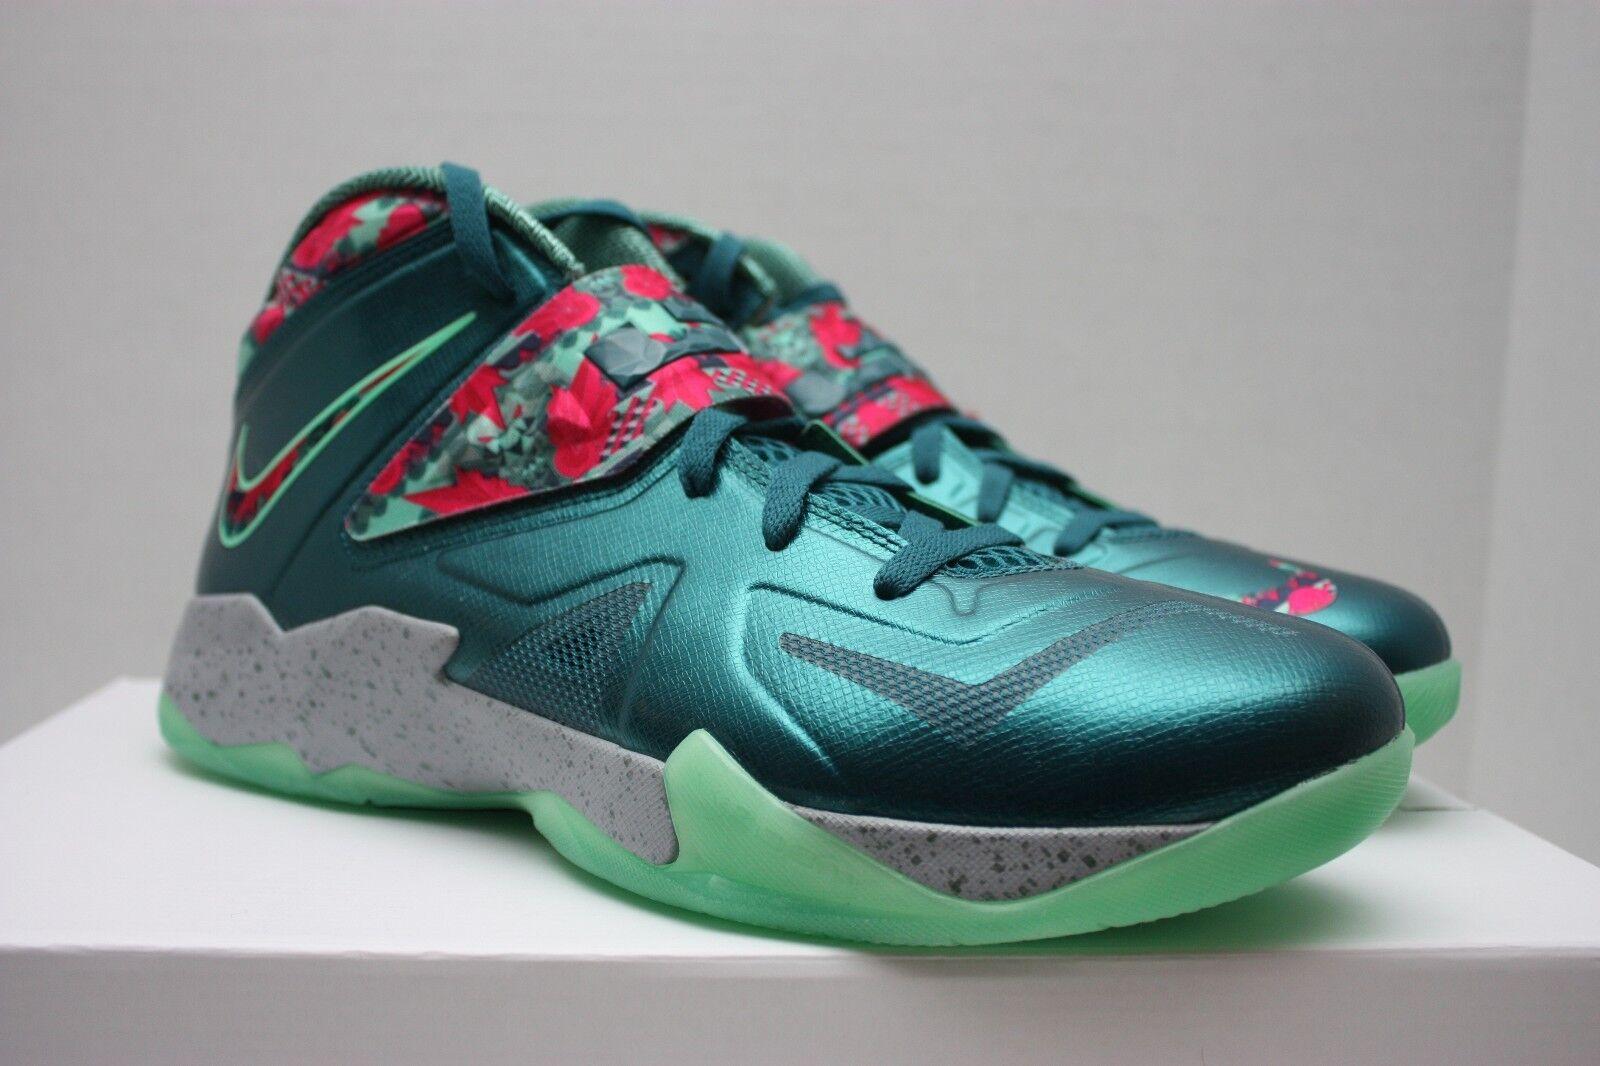 Nike zoom lebron zoom Nike soldato vii 7 coppia taglia 11 - south beach - 599264 300 311a3e